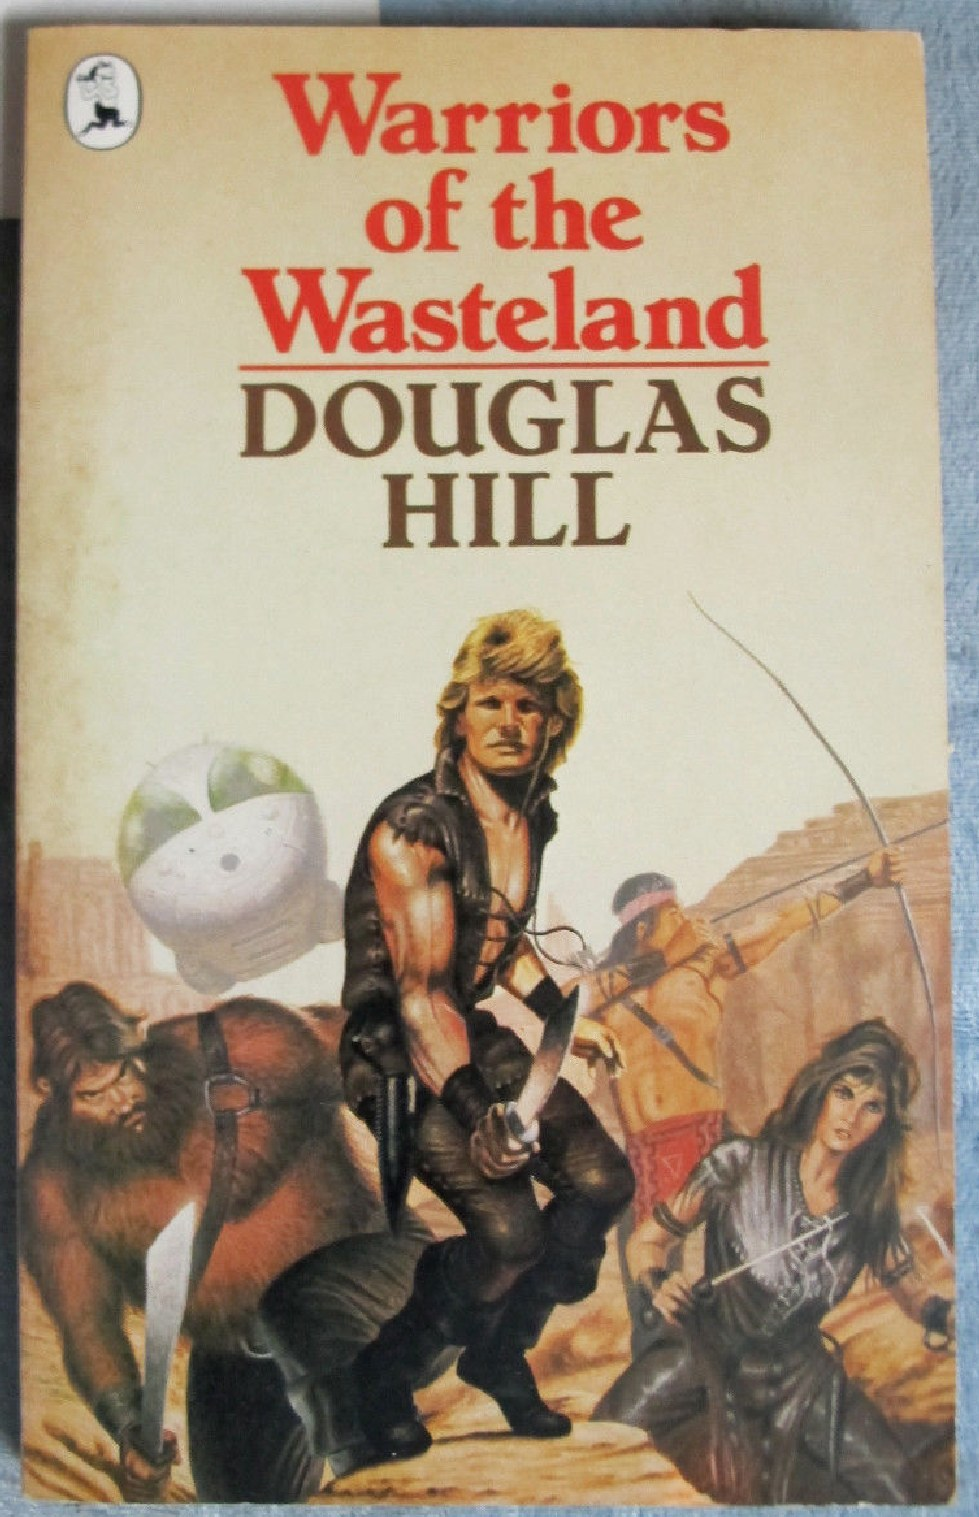 Warriors of the Waistcoat